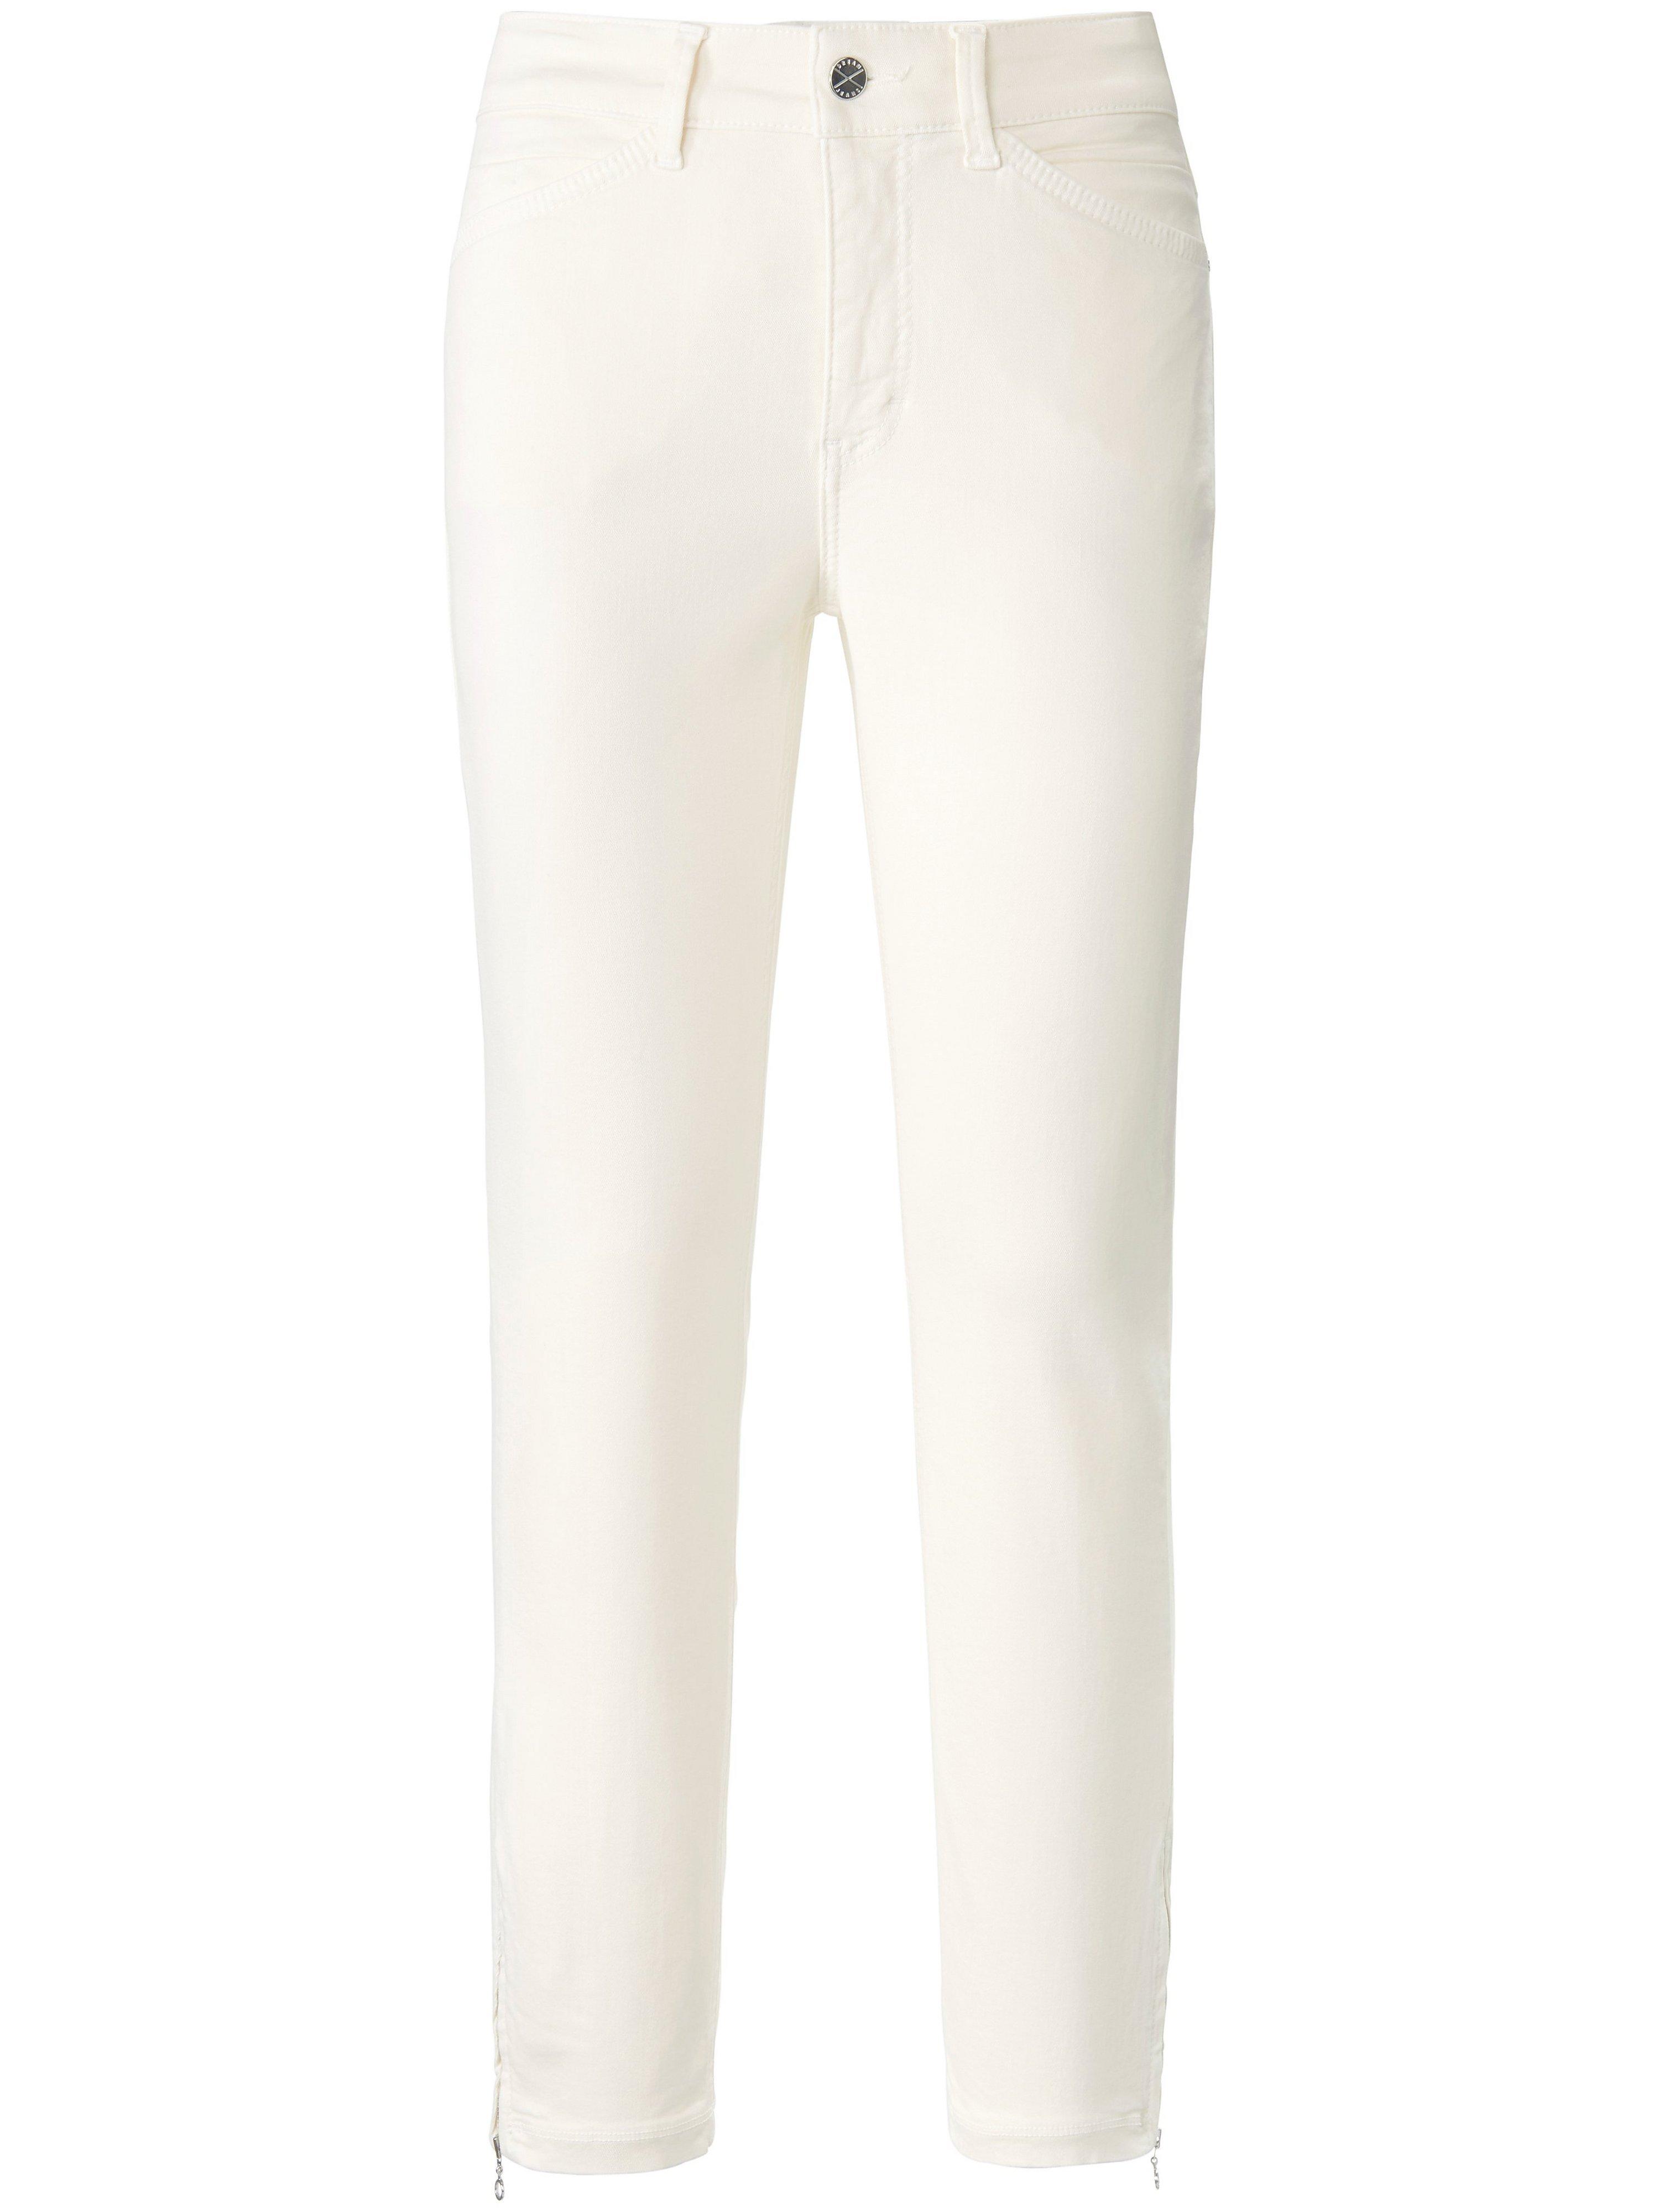 Jeans Dream Chic extra smalle pijpen Van Mac wit